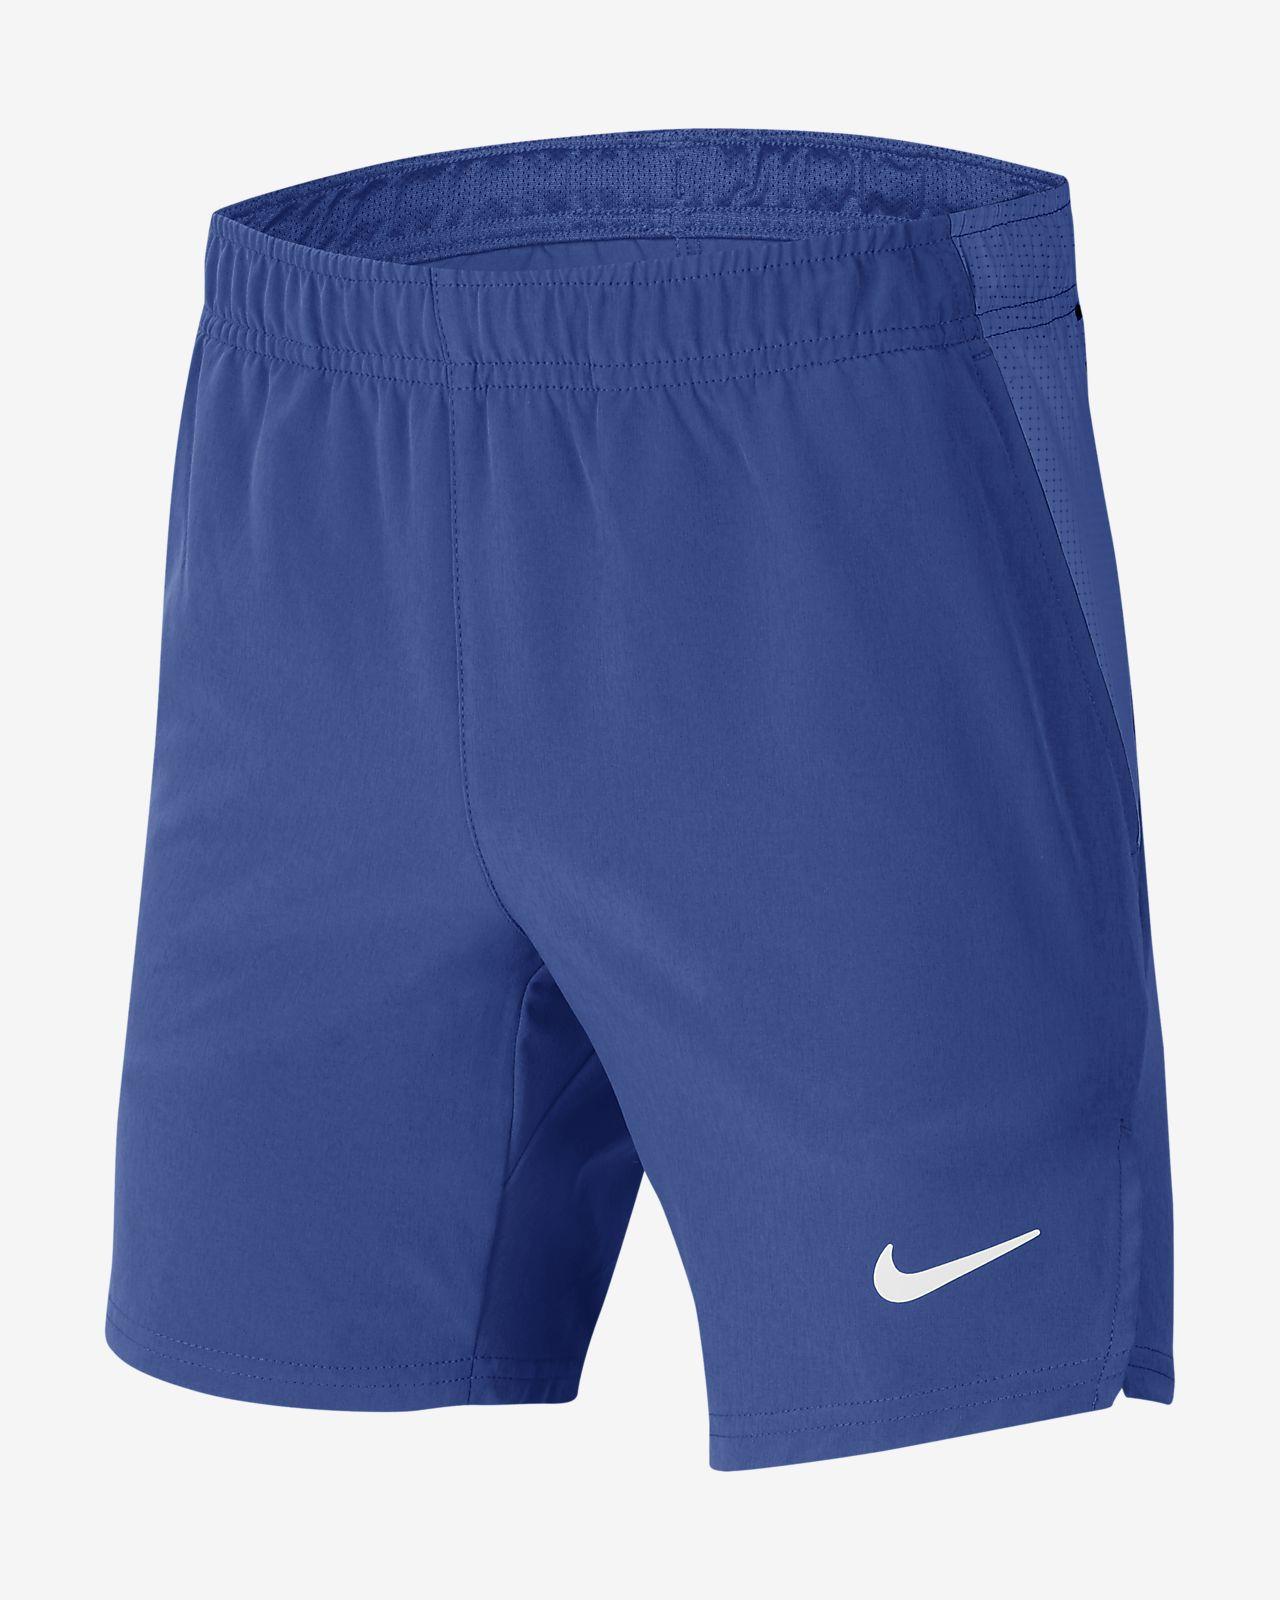 NikeCourt Flex Ace Older Kids' (Boys') Tennis Shorts